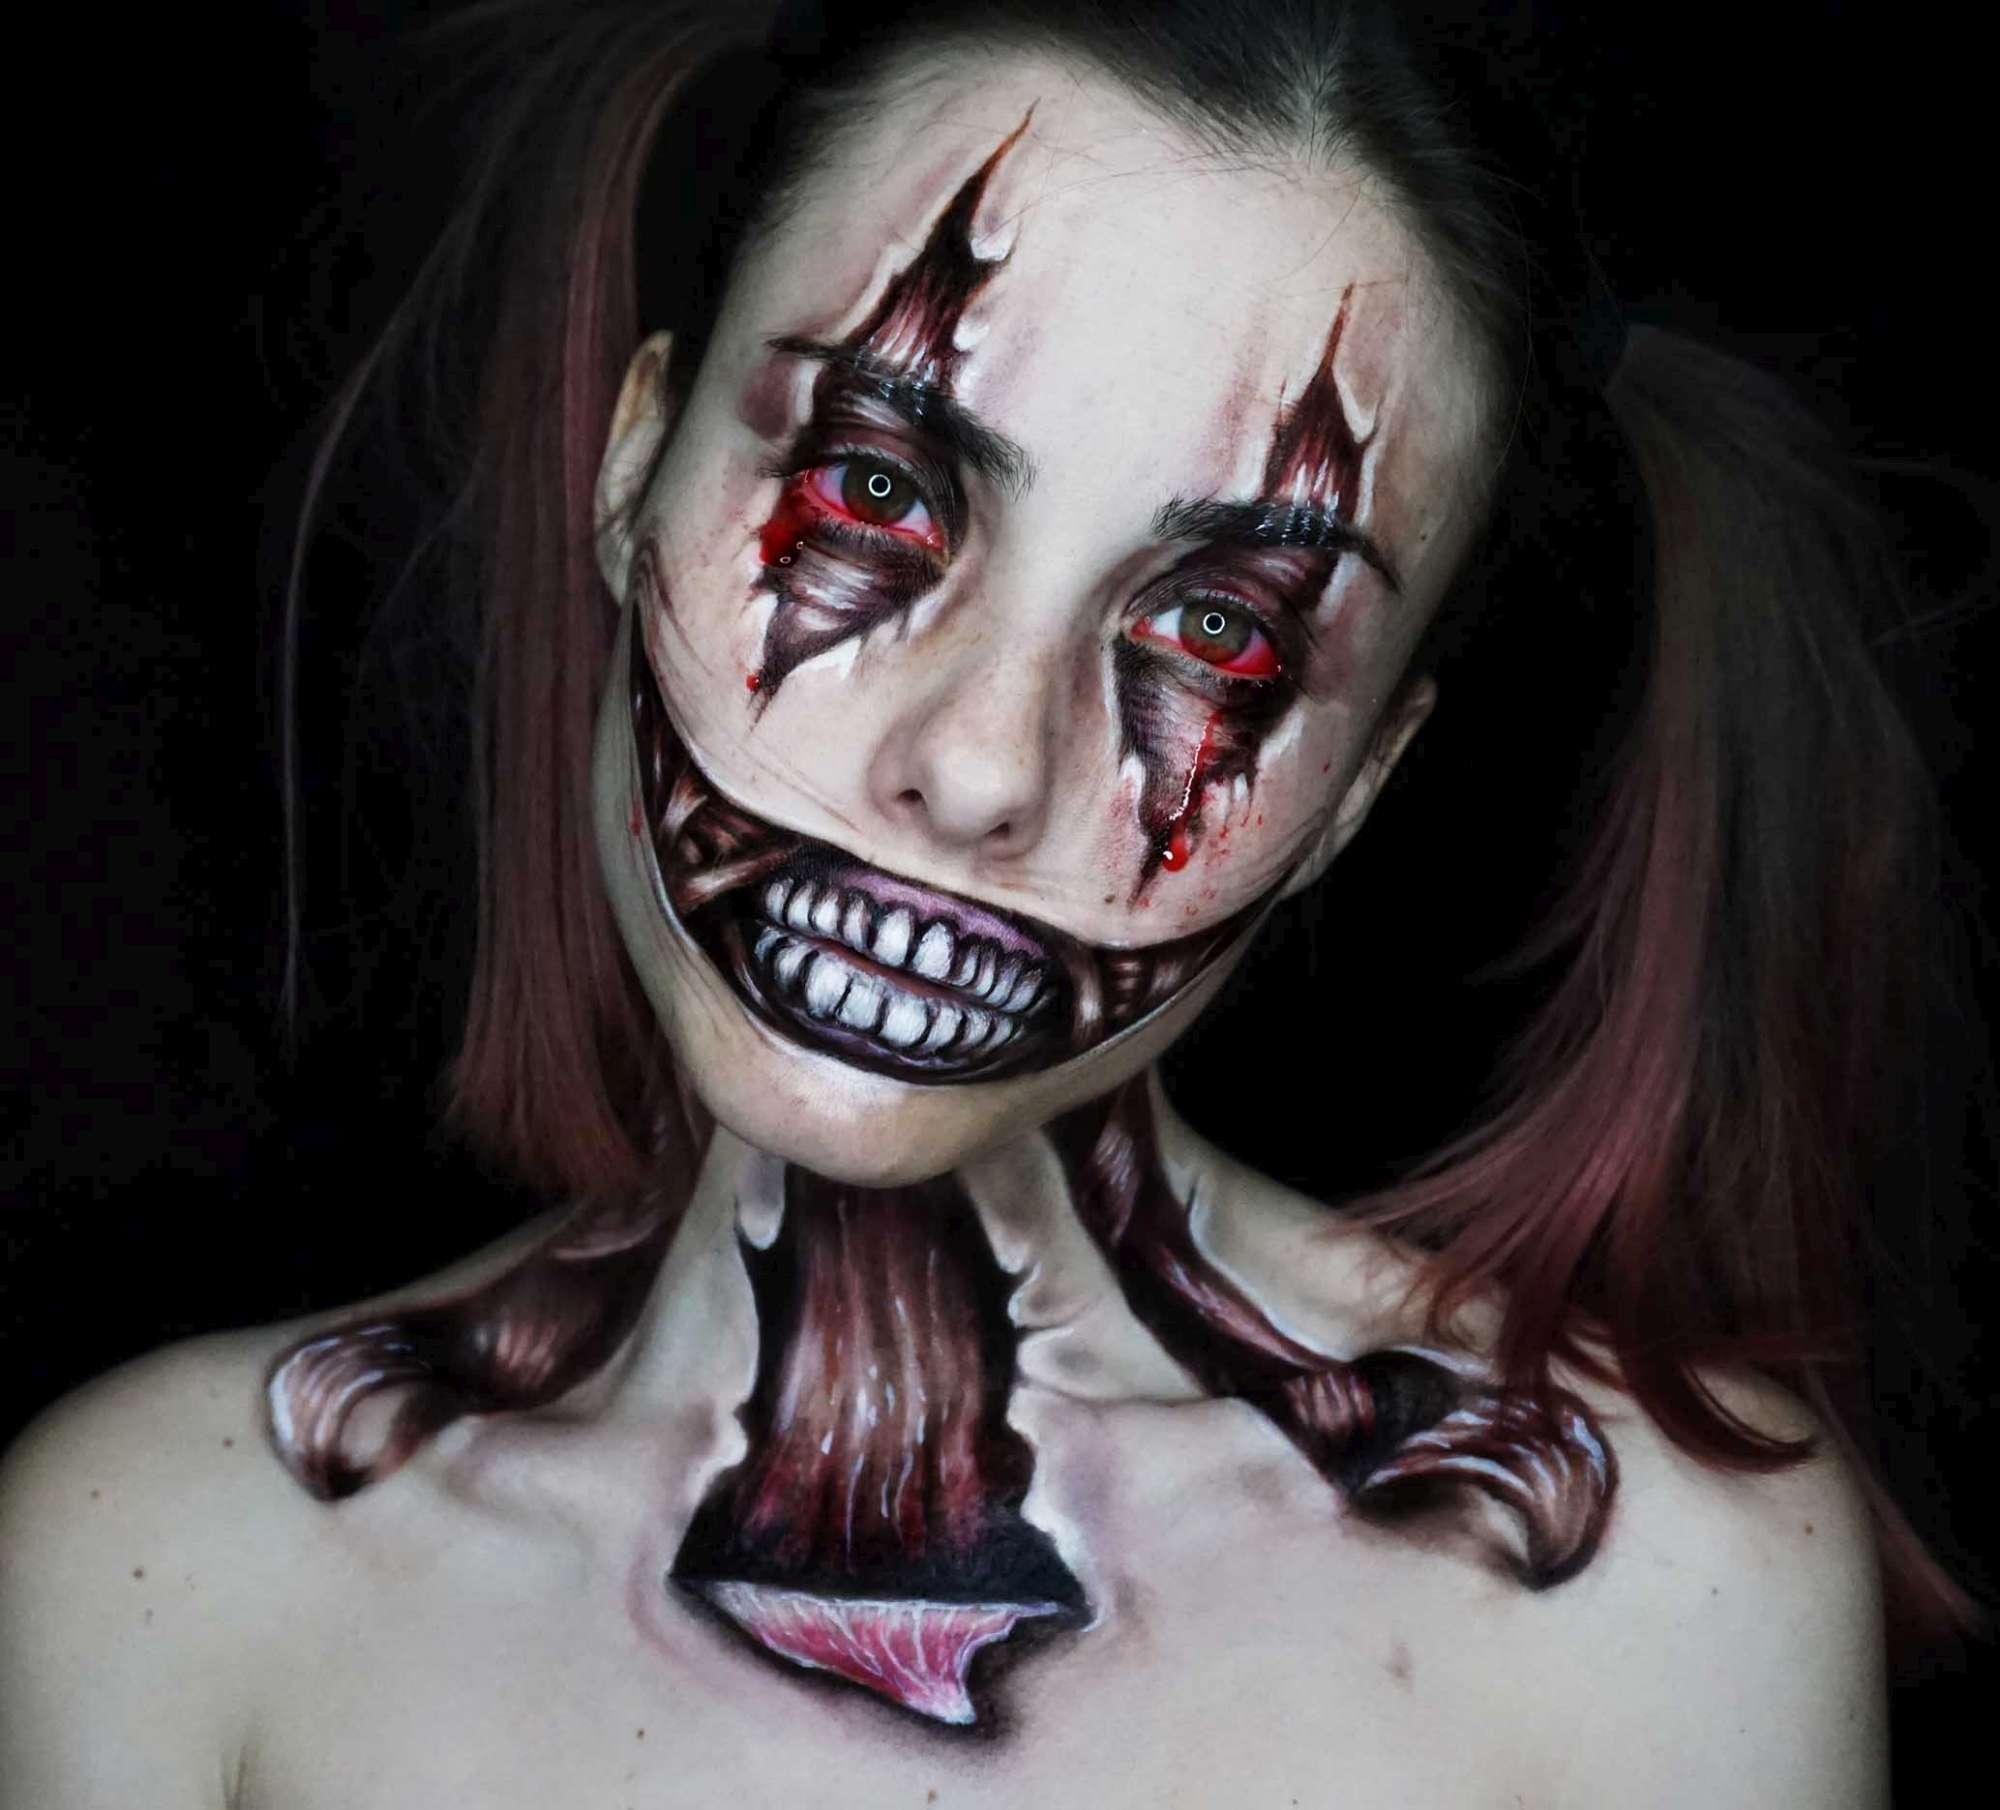 Halloween  scopri i trucchi da paura - Tgcom24 1f7ea599d0ce